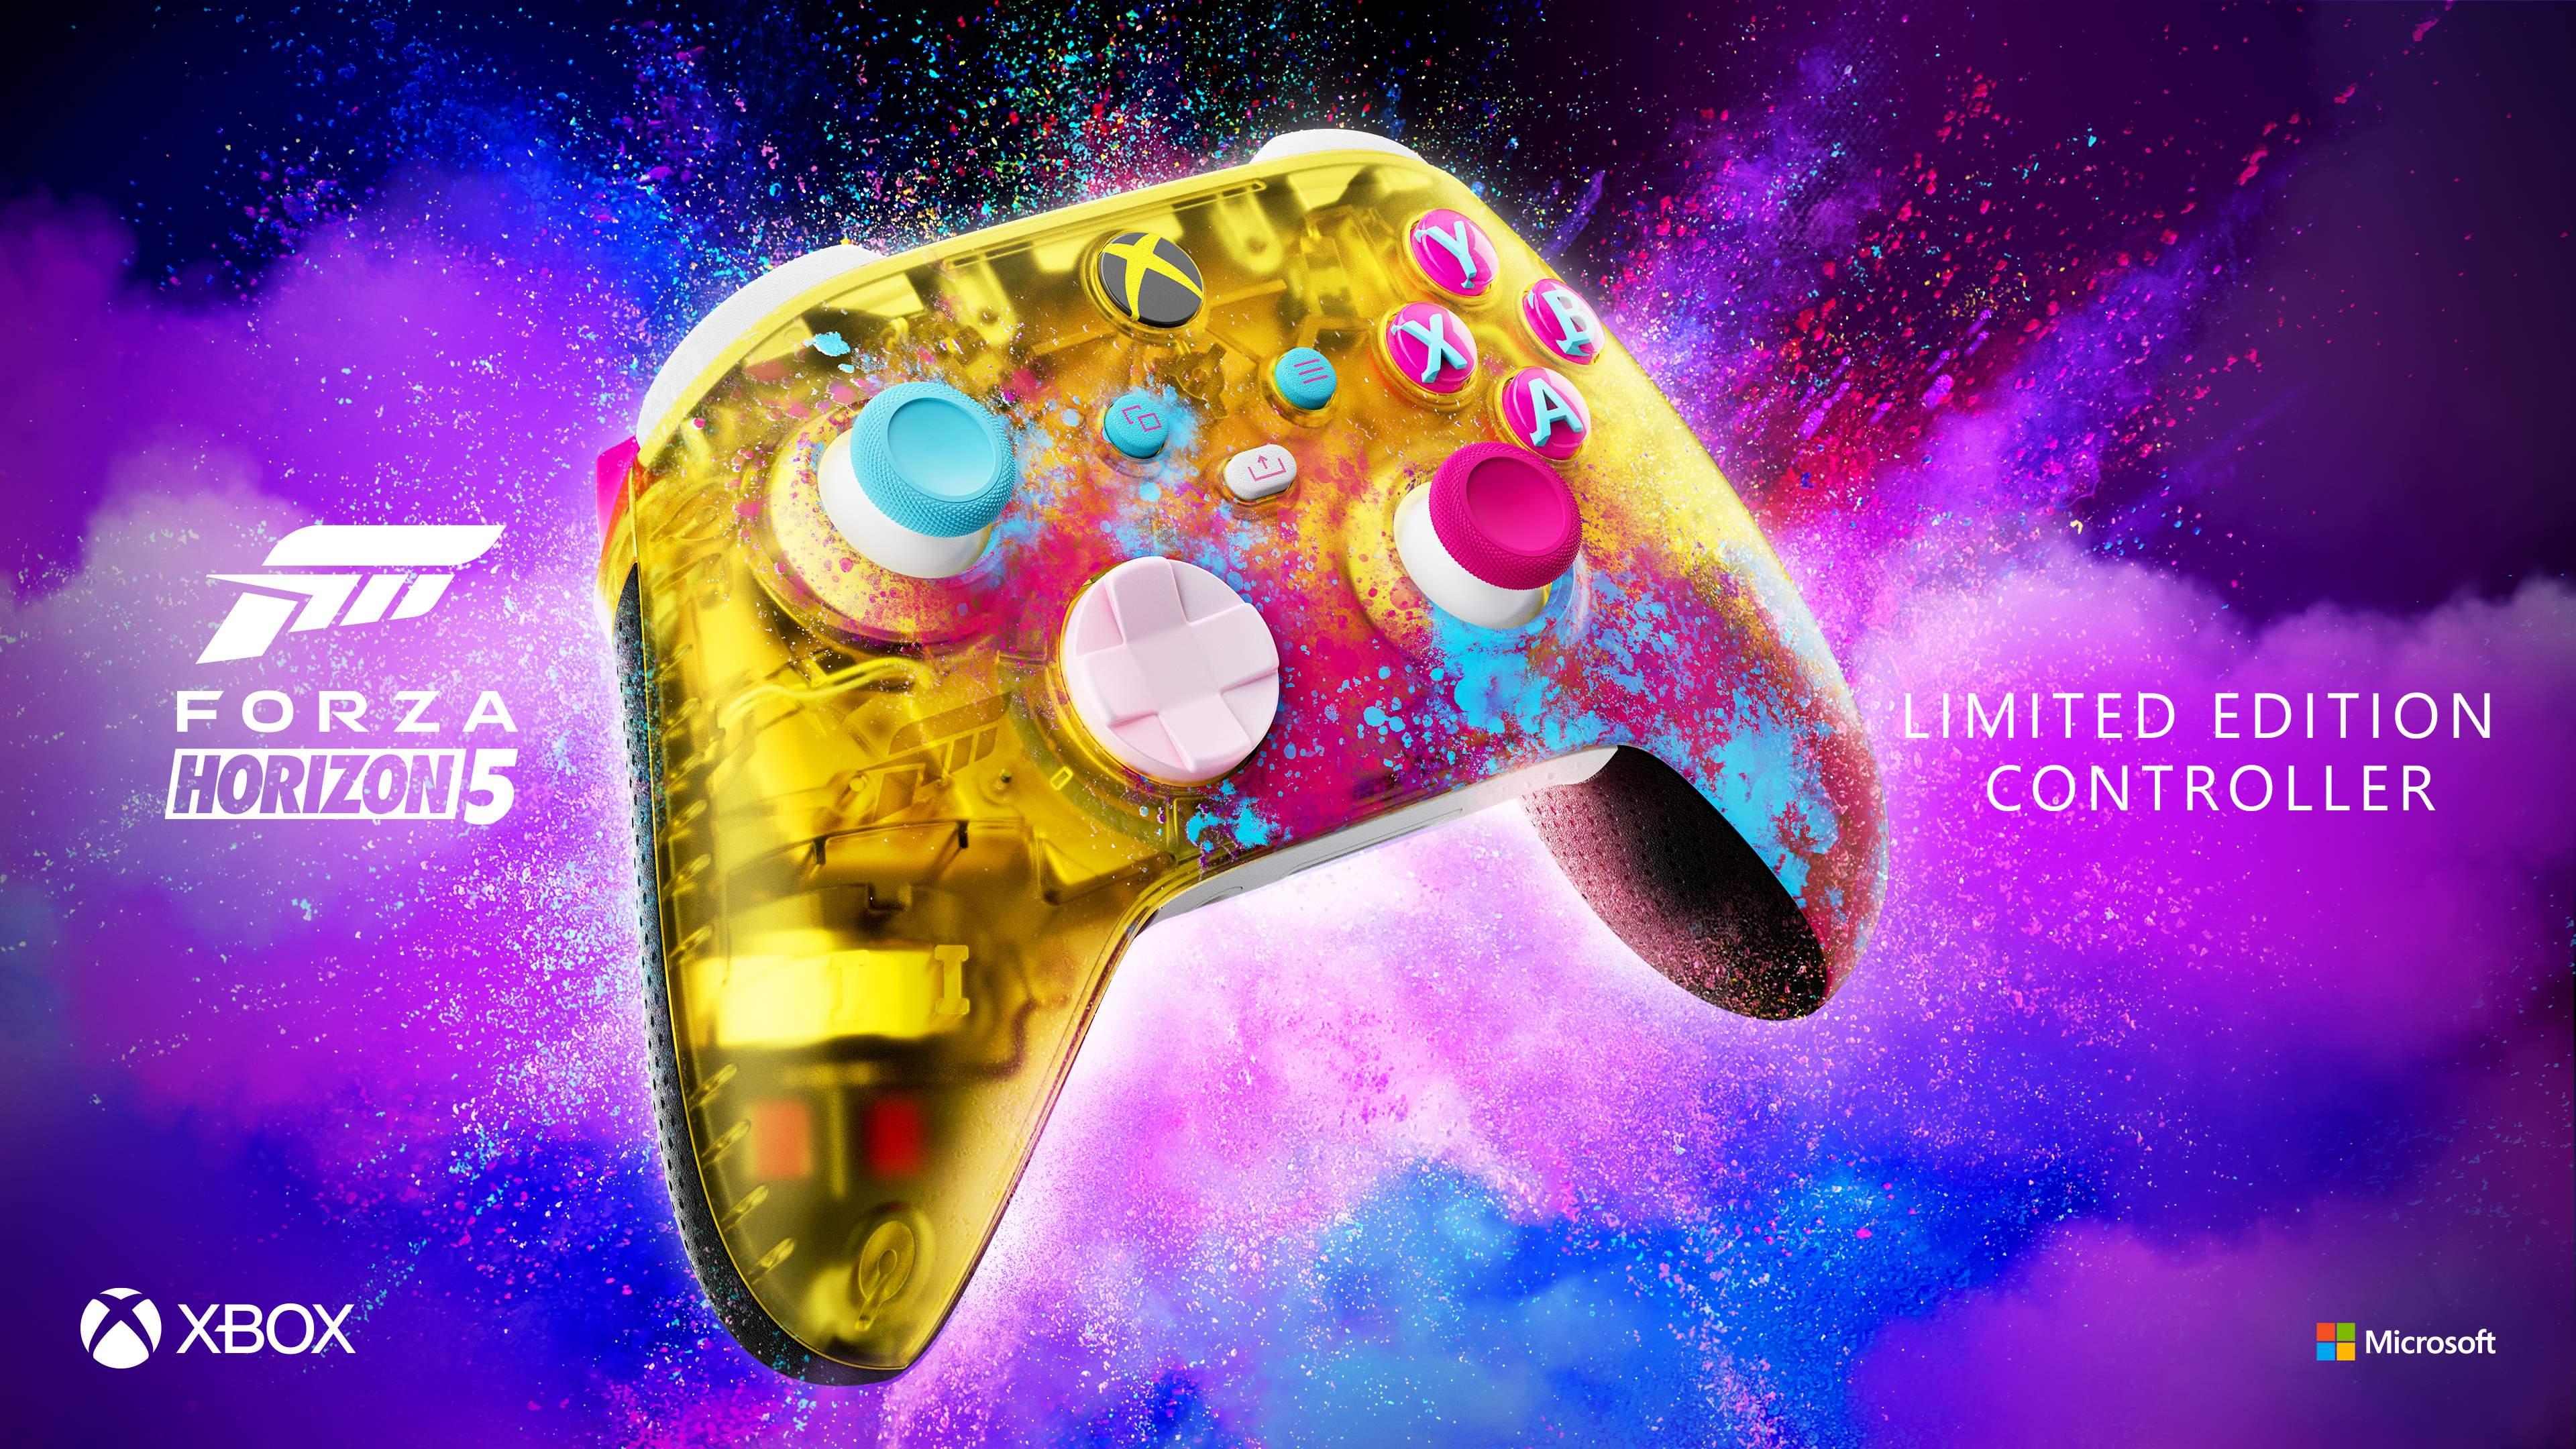 Xbox Controler Forza Horizon 5 Limited Edition